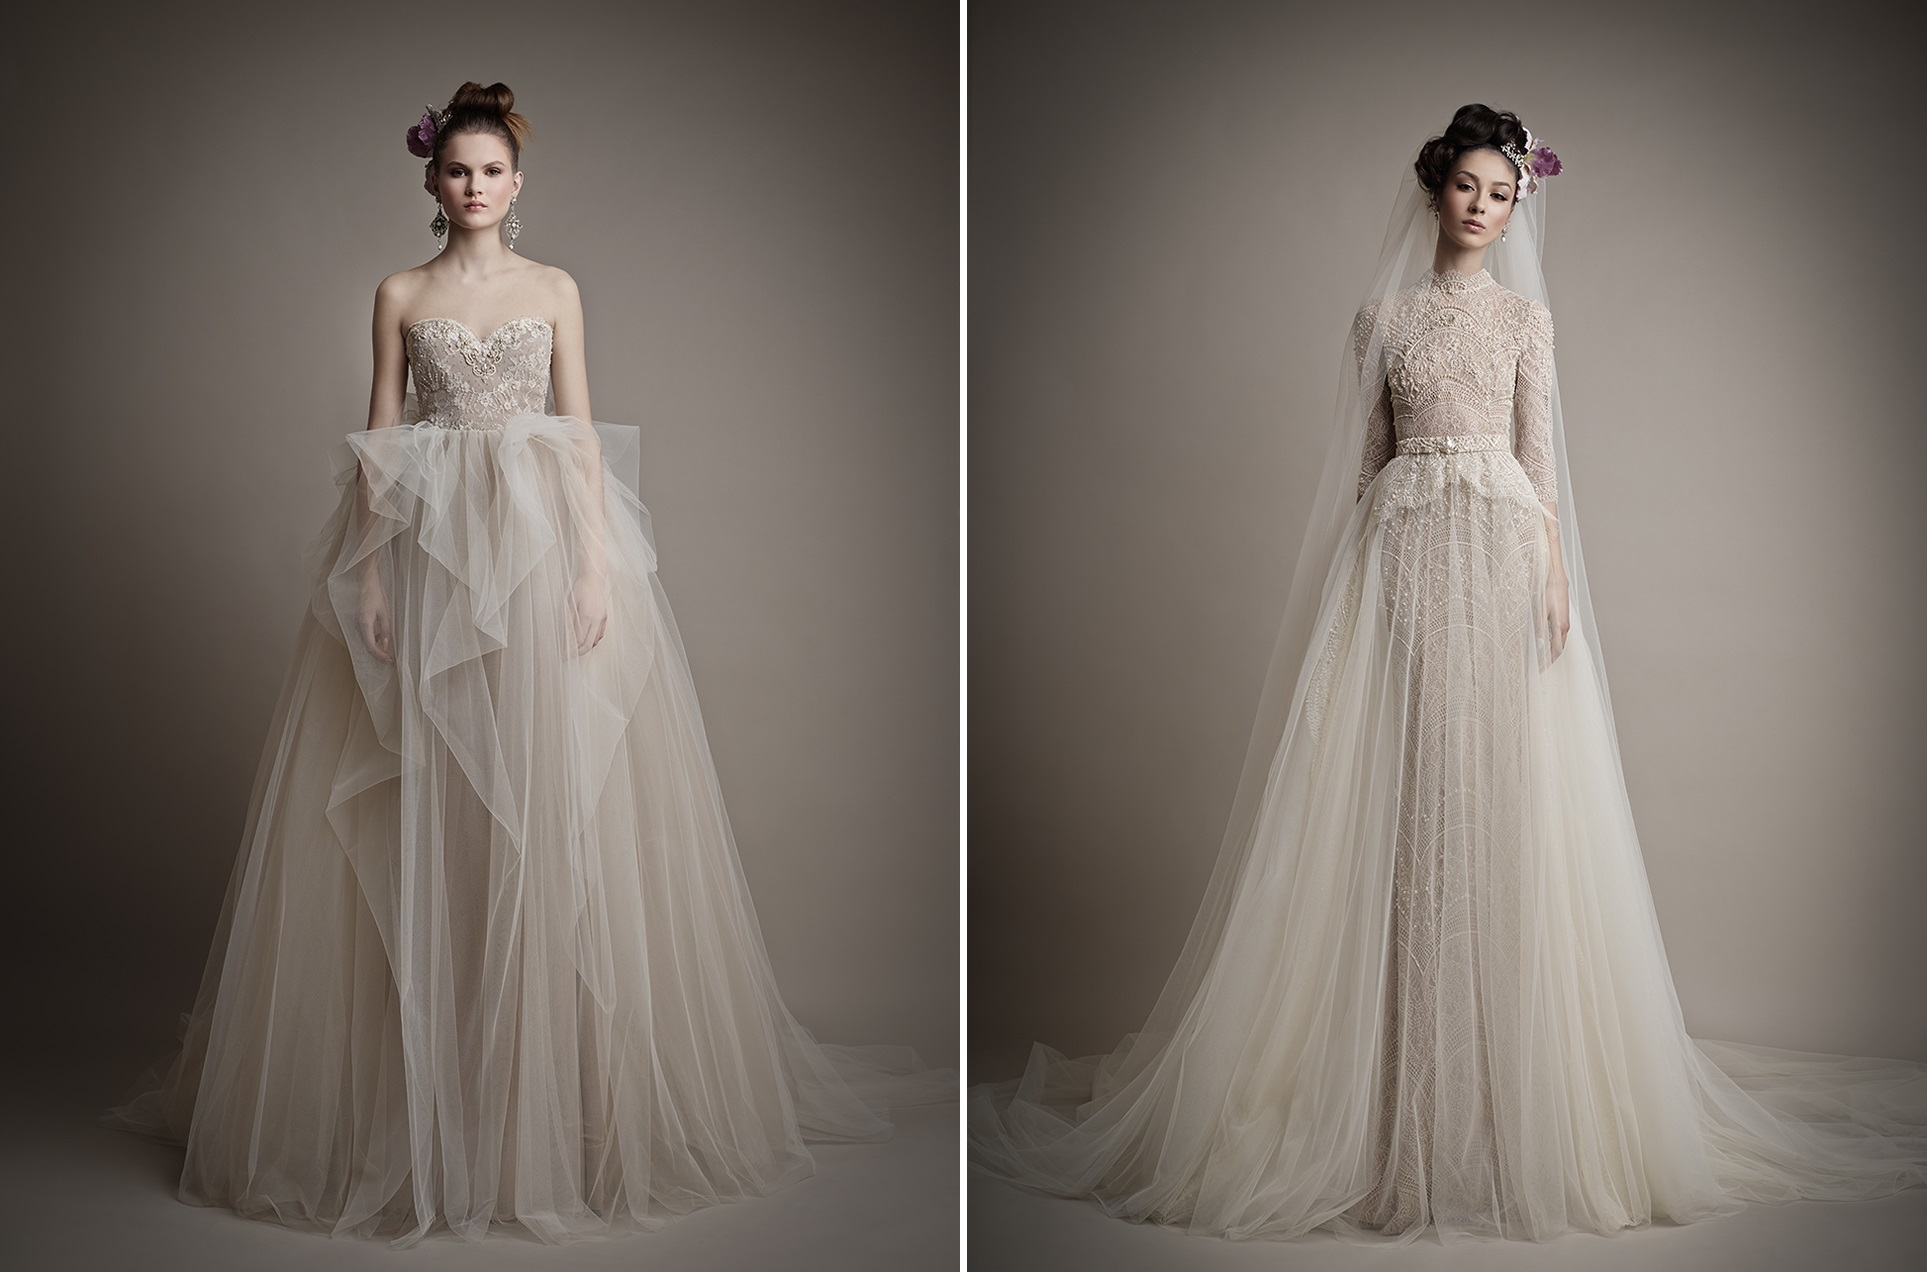 Ersa Atelier's 2015 Bridal Collection - Ang Mey & Eirene Wedding Dresses